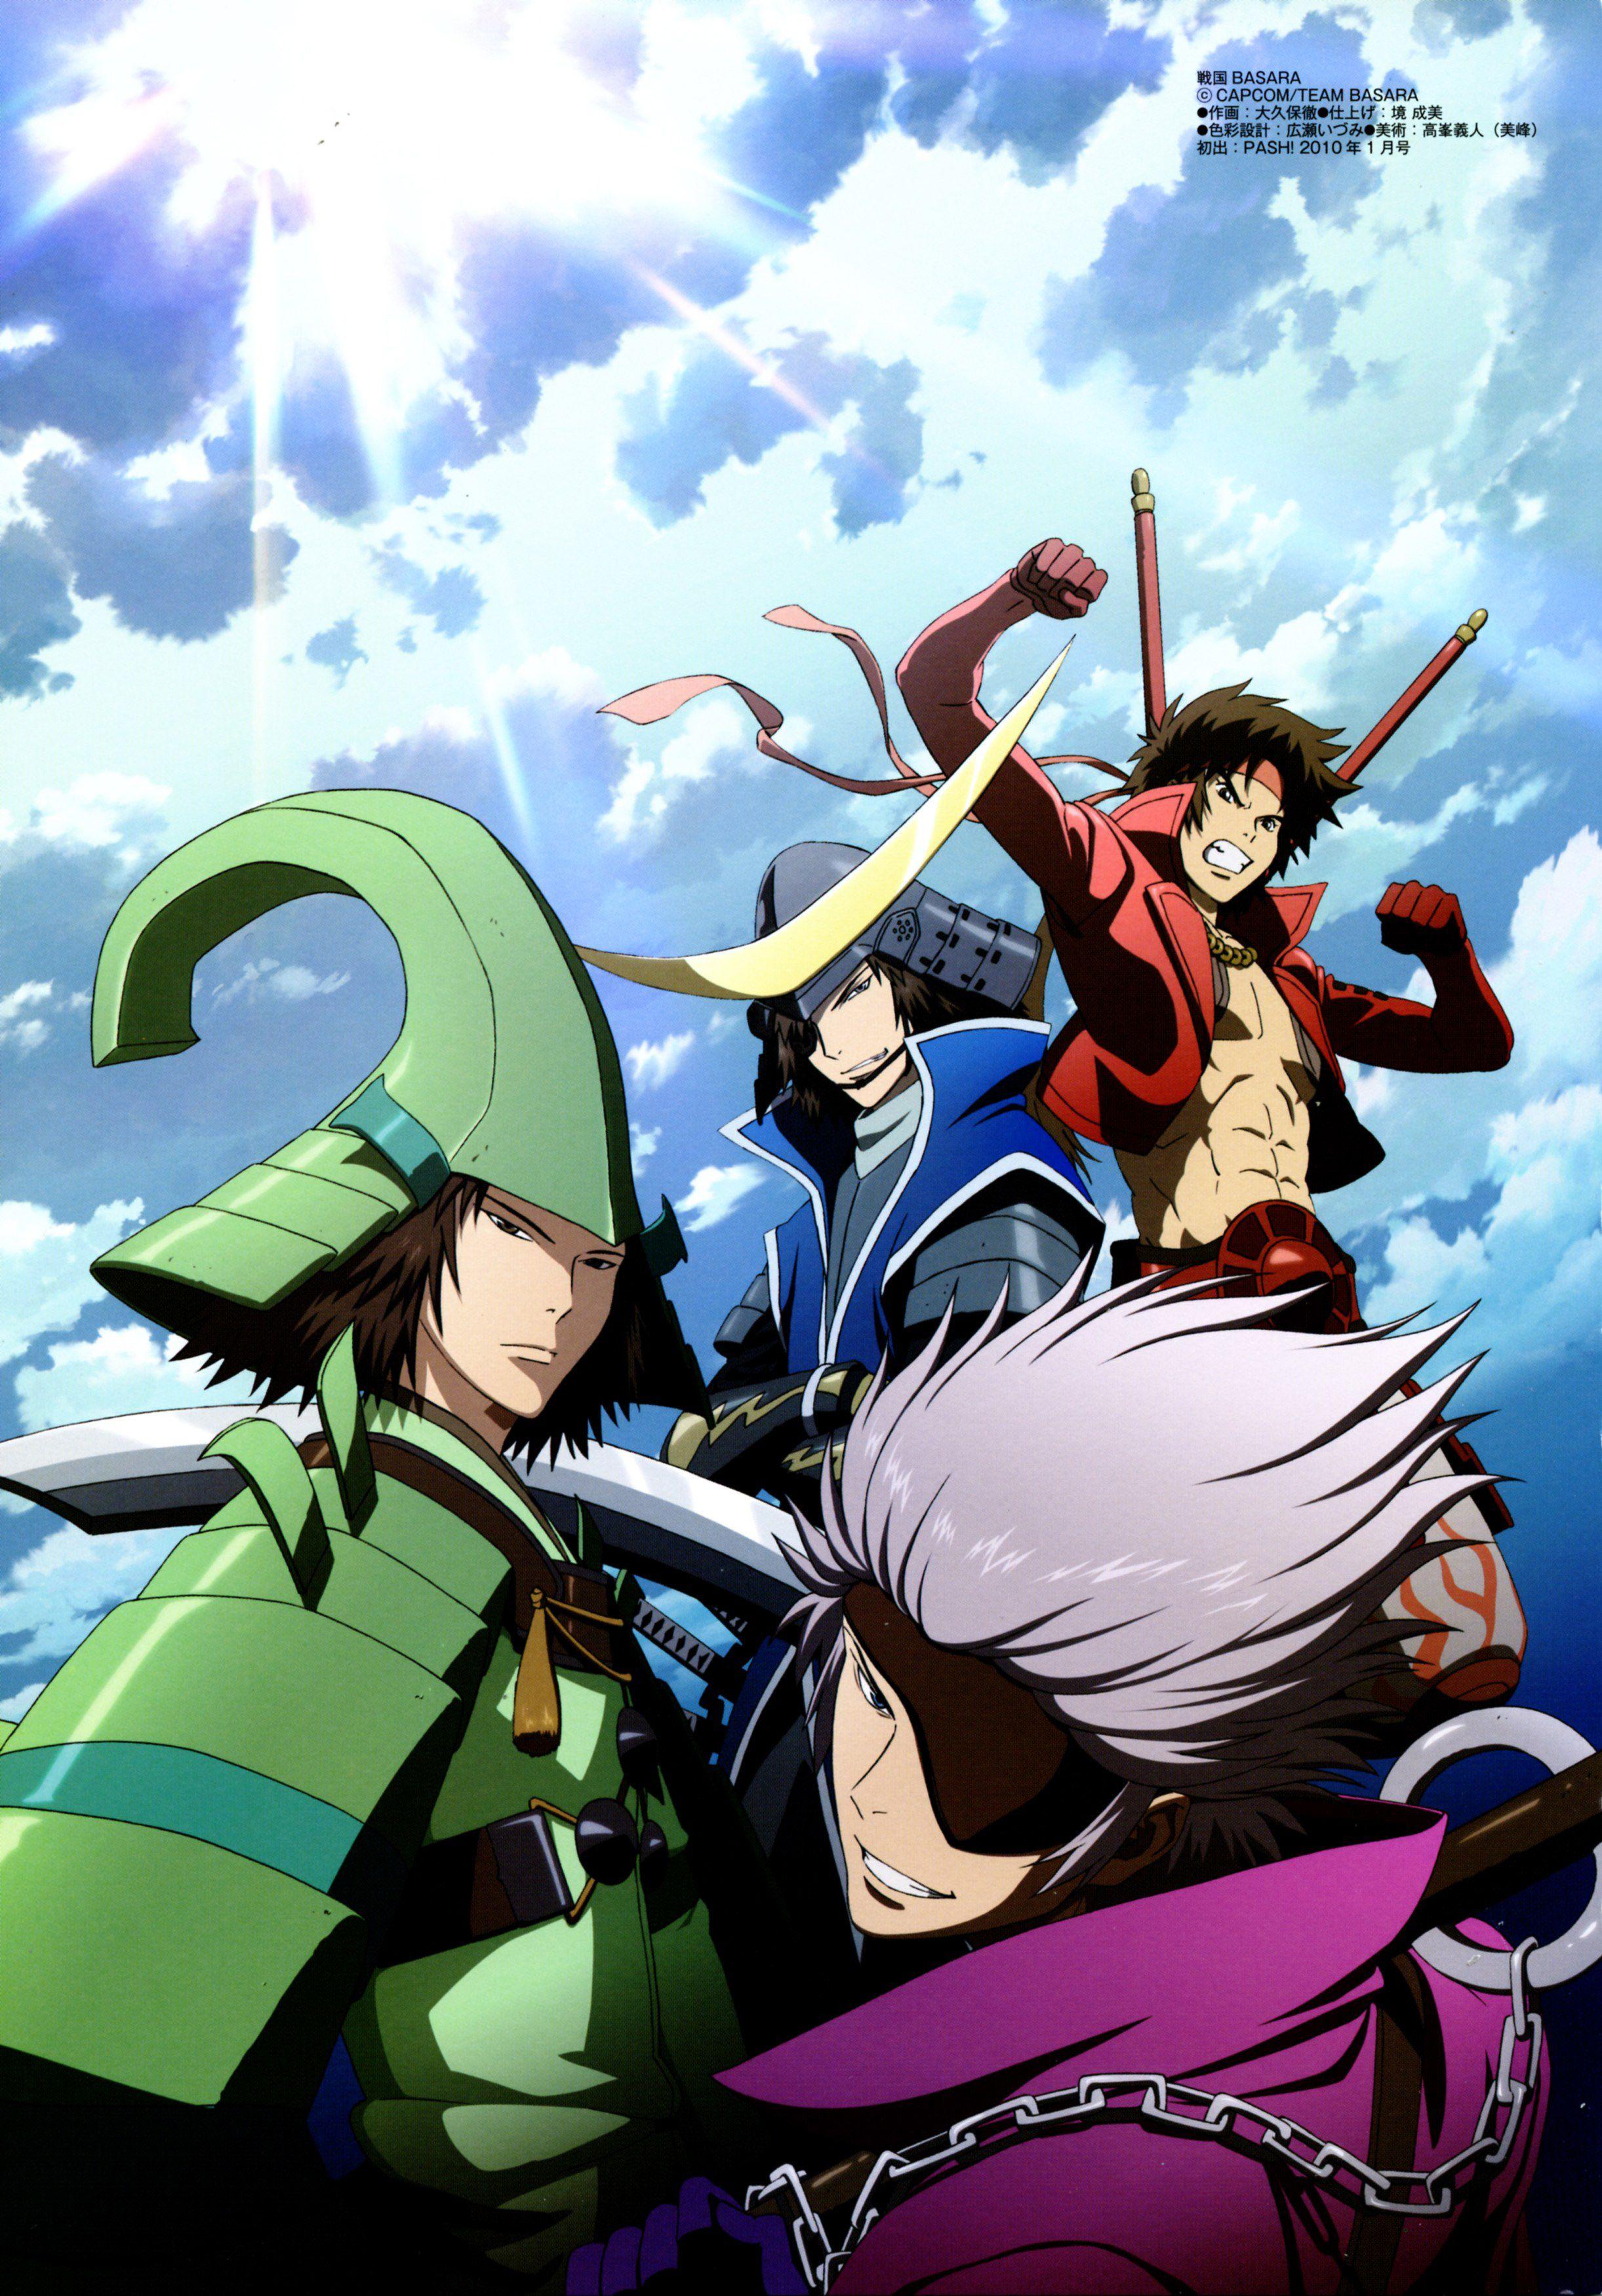 Favorite Video Game Series Sengoku Basara My favorite